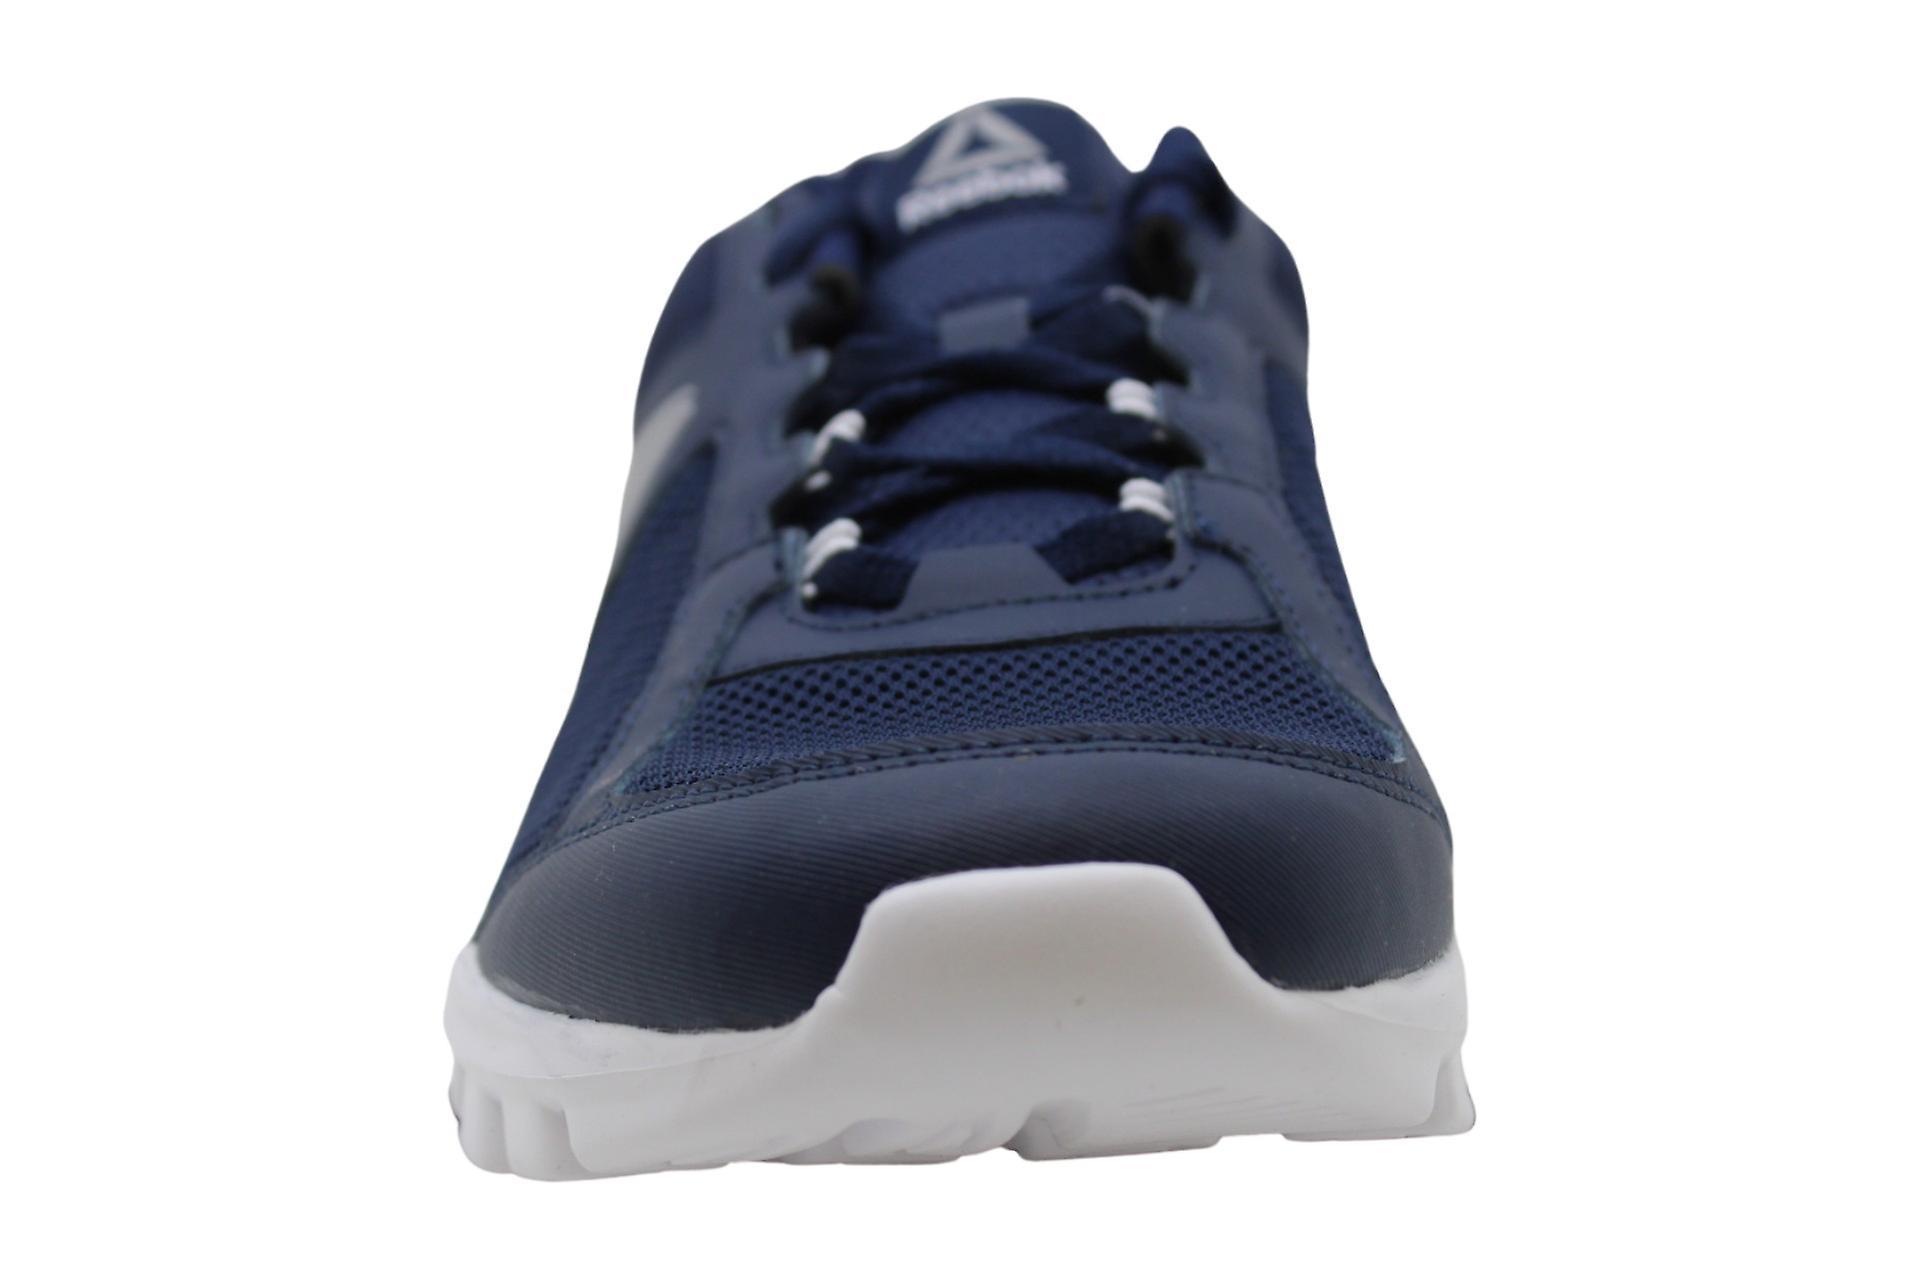 Reebok Men's Shoes Yourflex train 9.0 Low Top Lace Up Fashion Sneakers